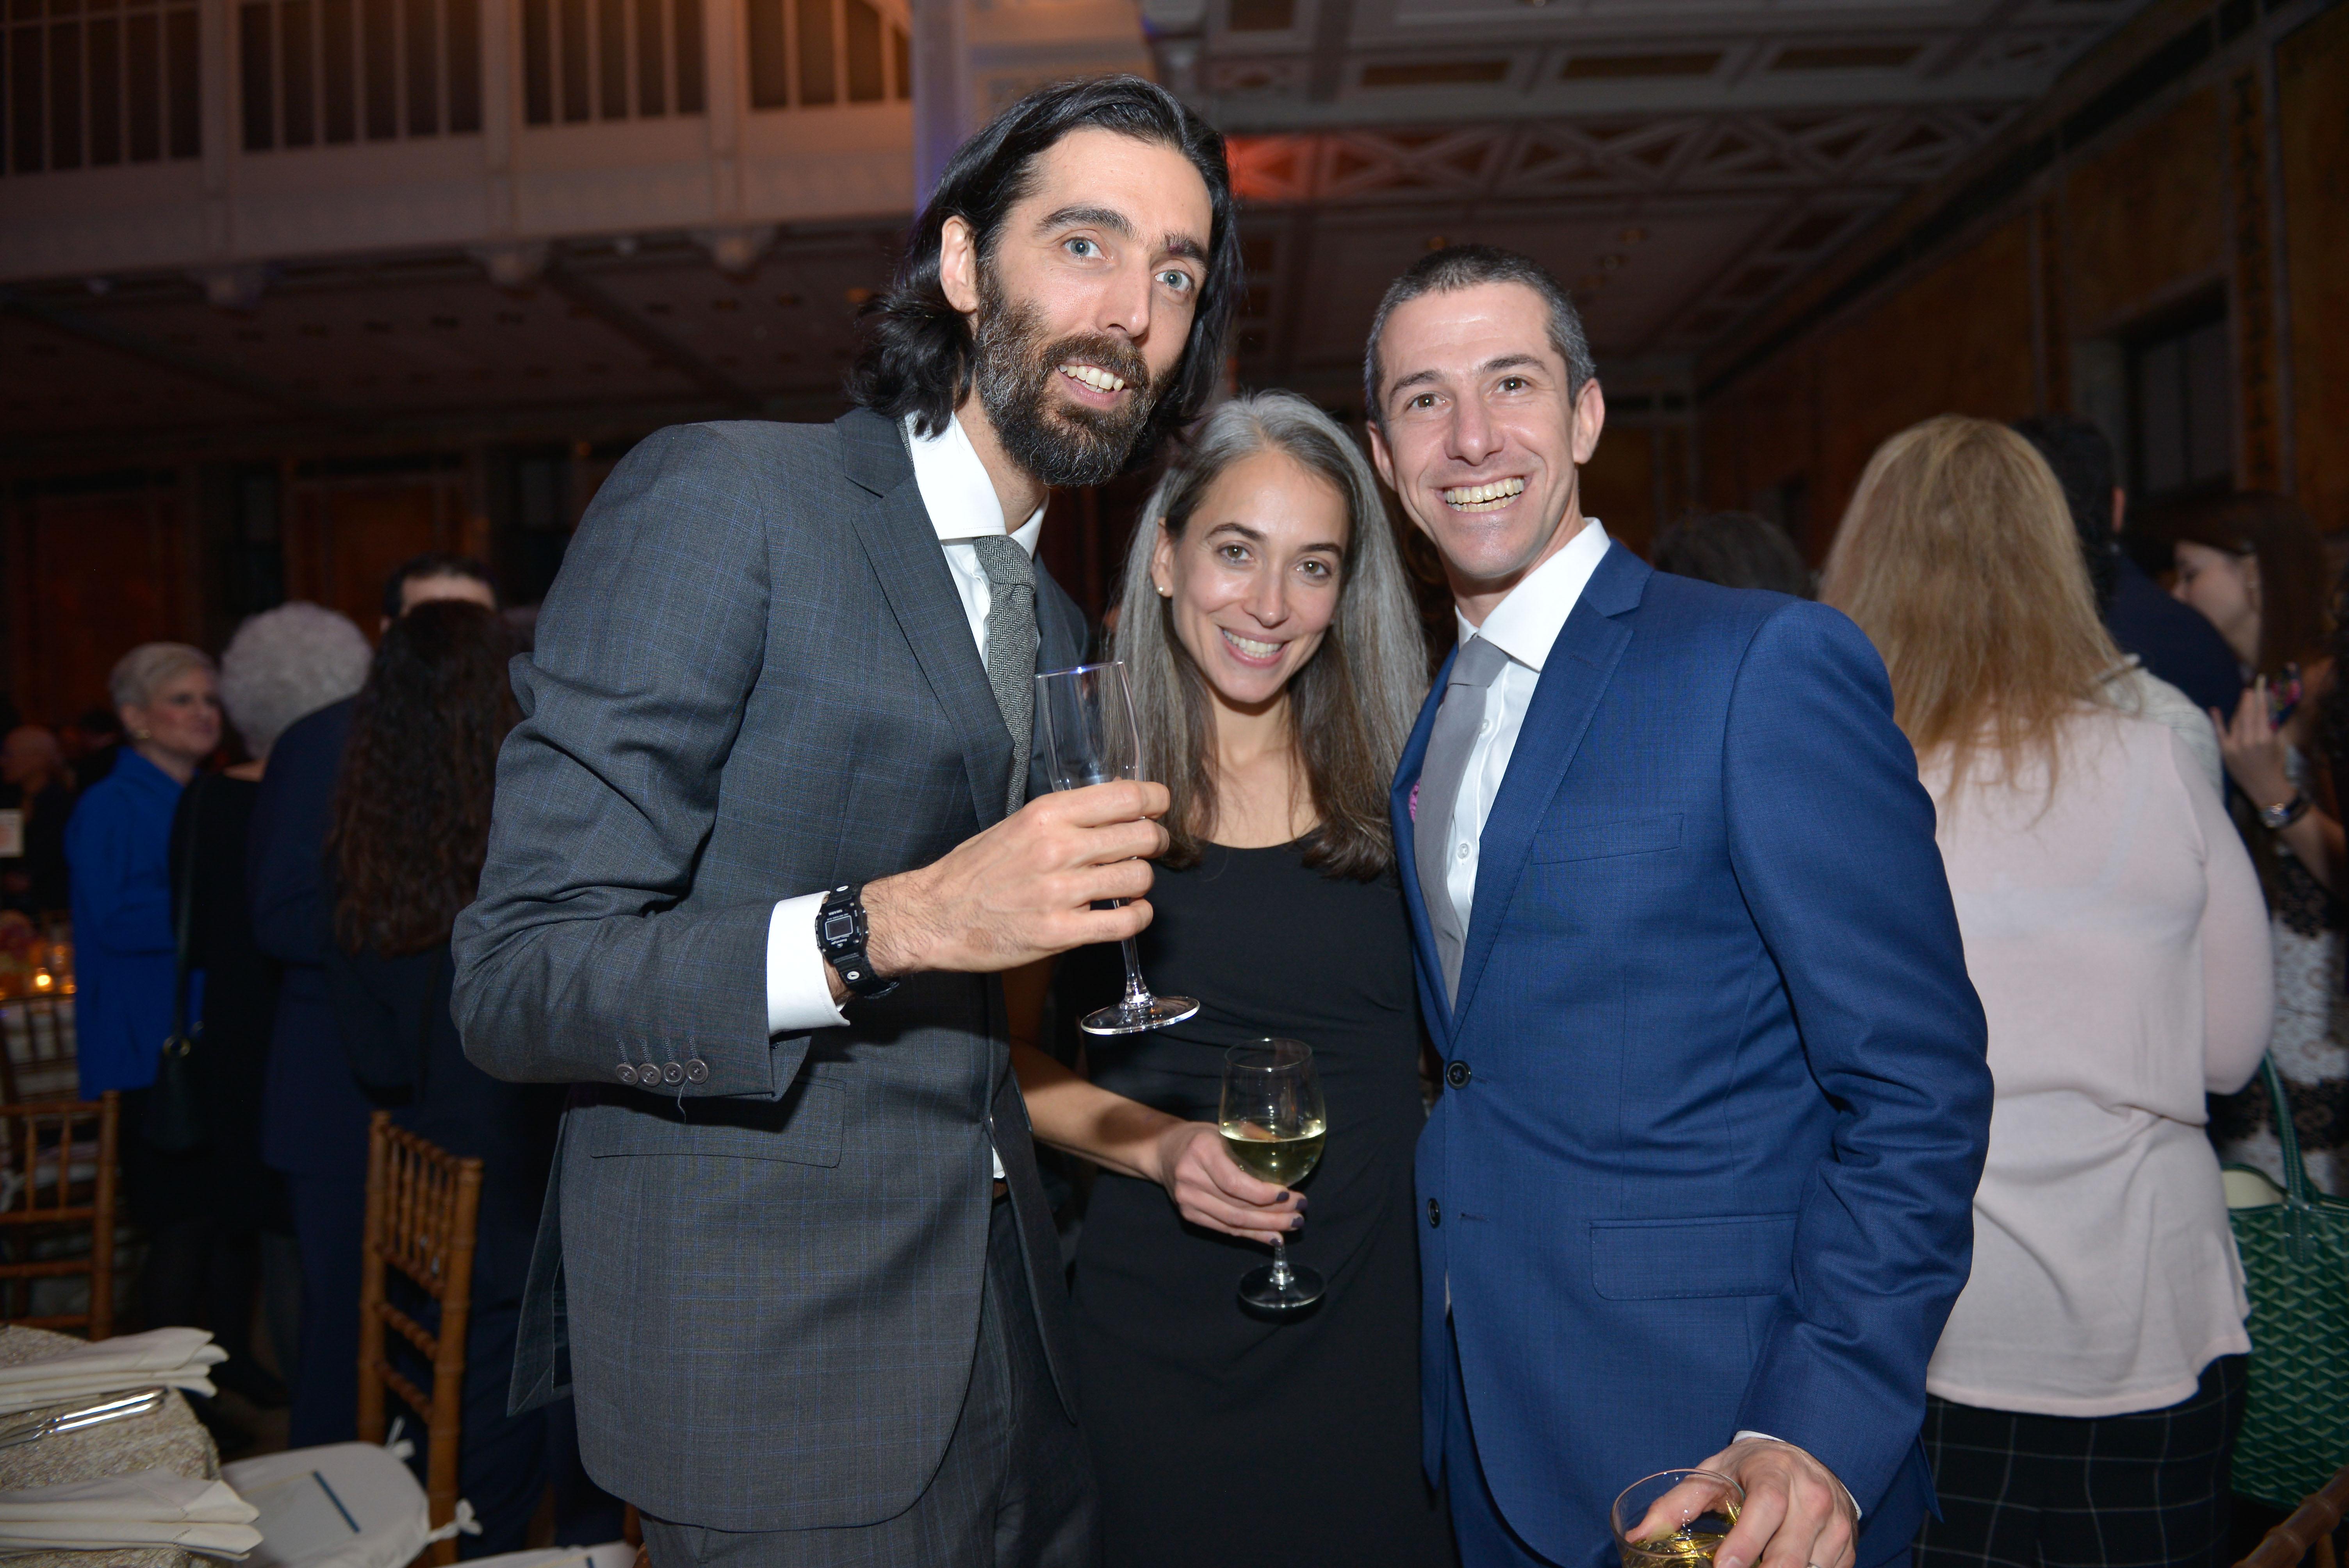 From left: 2017 Pomegranate Prize Recipient Yoni Stadlin, Rachel Kaunfer, and 2018 Pomegranate Prize Recipient Oren Kaunfer.